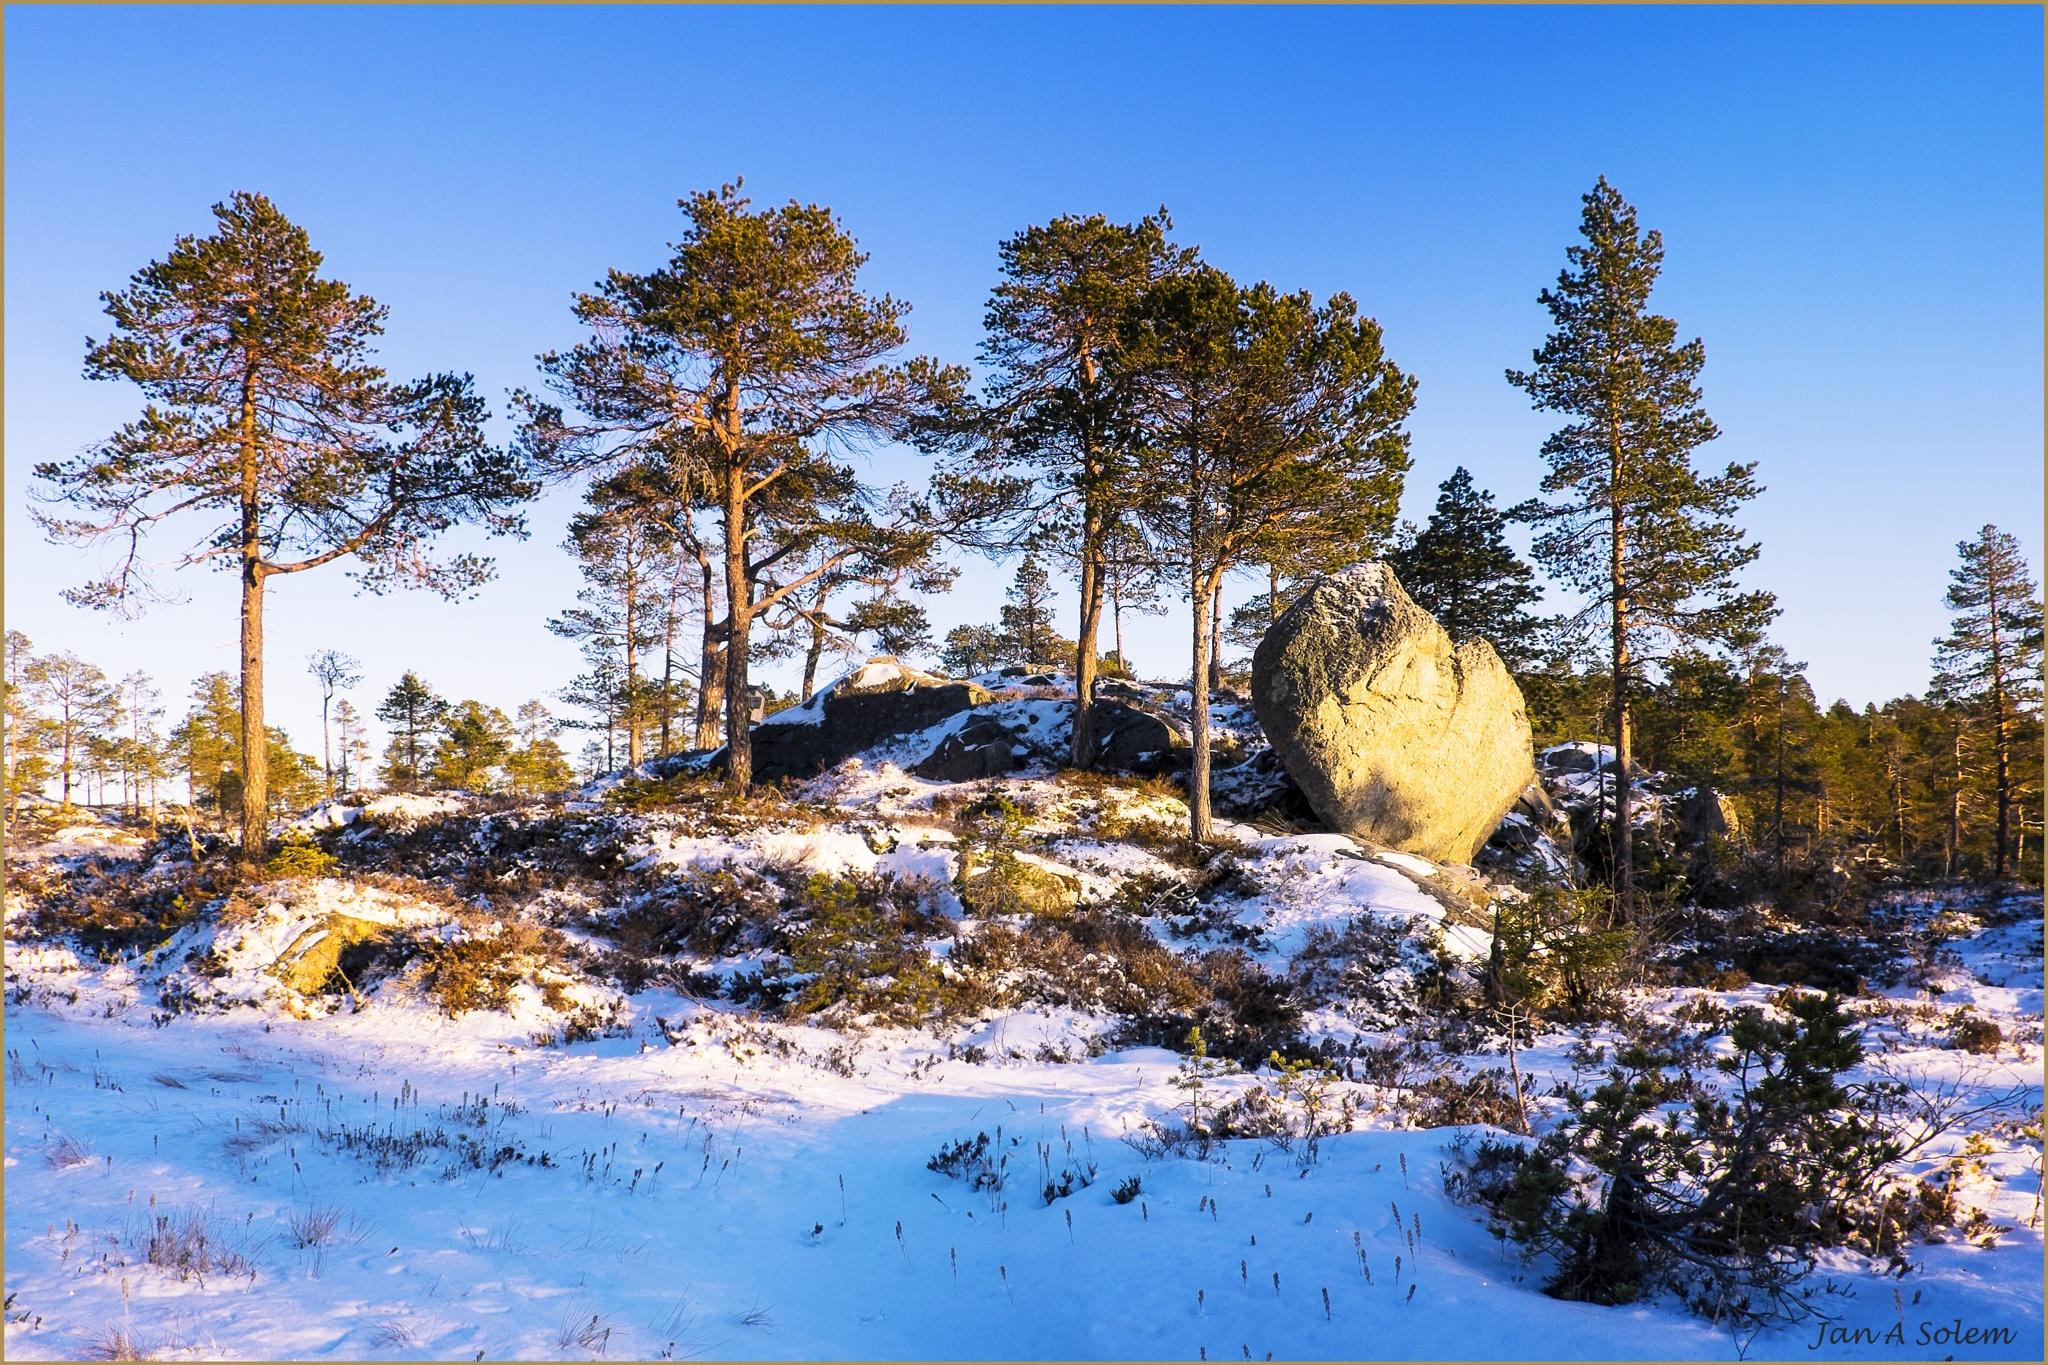 Hiking destination by Jan Arvid Solem